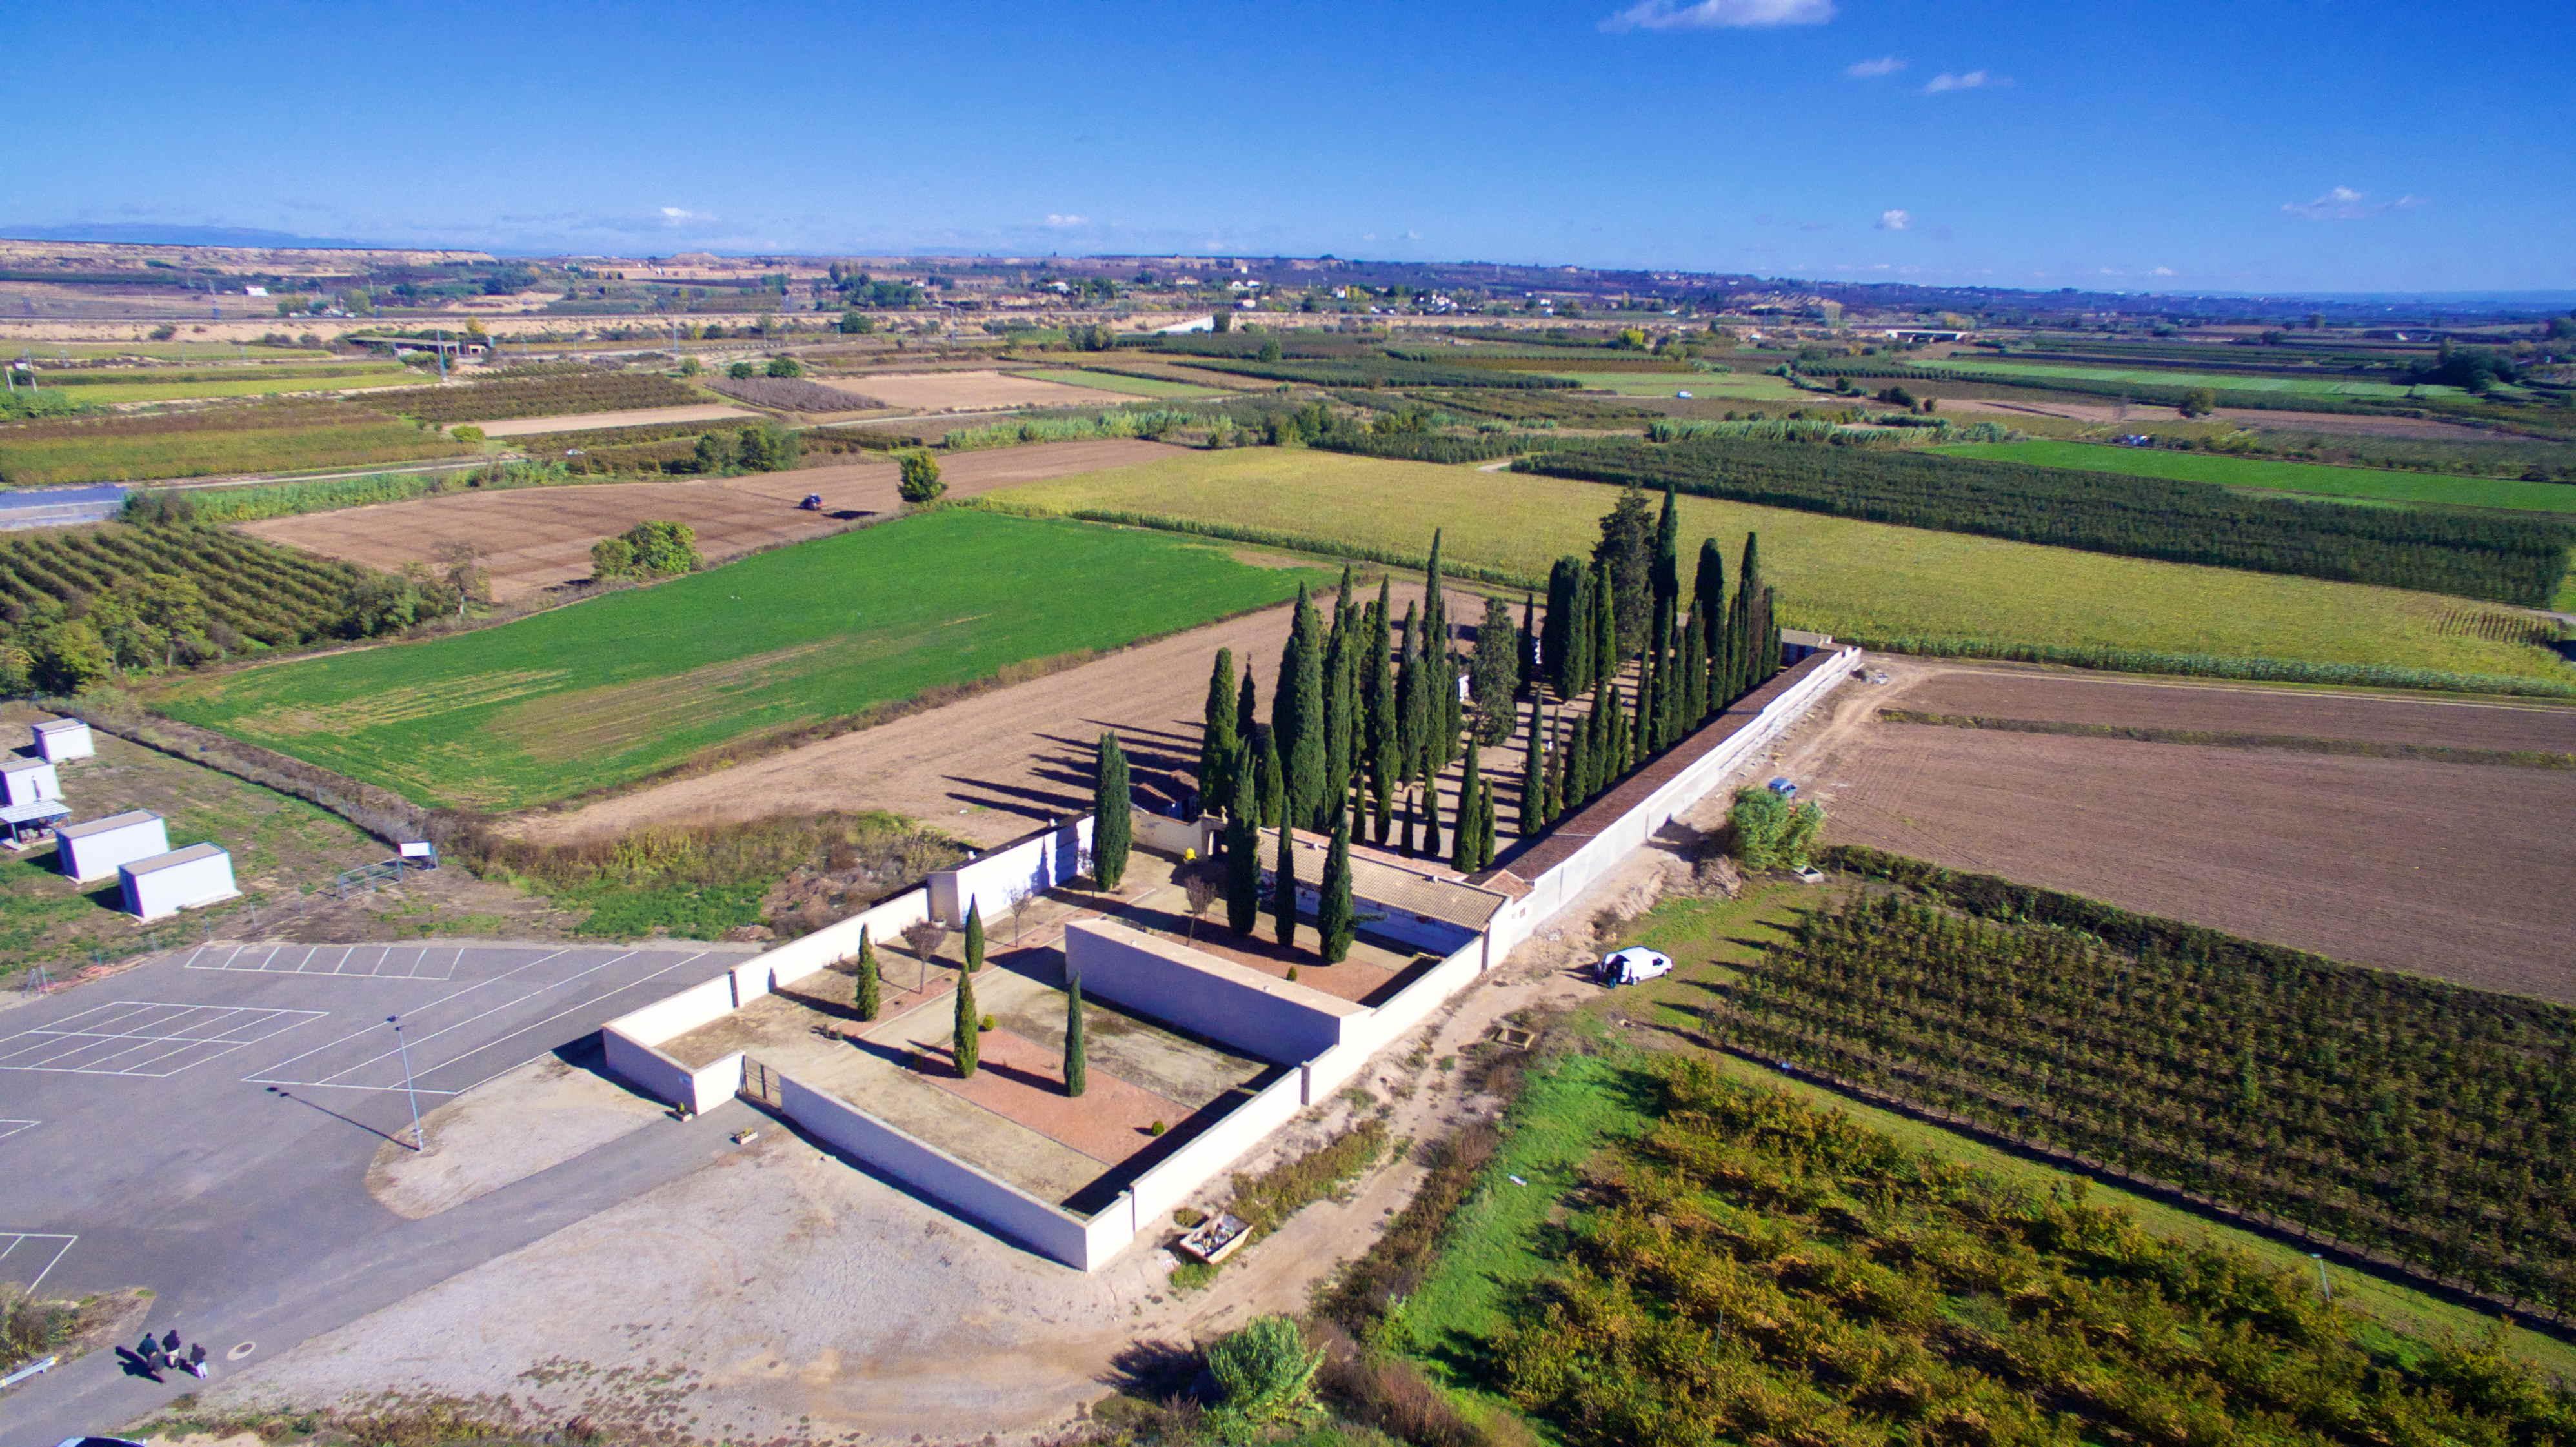 Puigverd de Lleida Drone